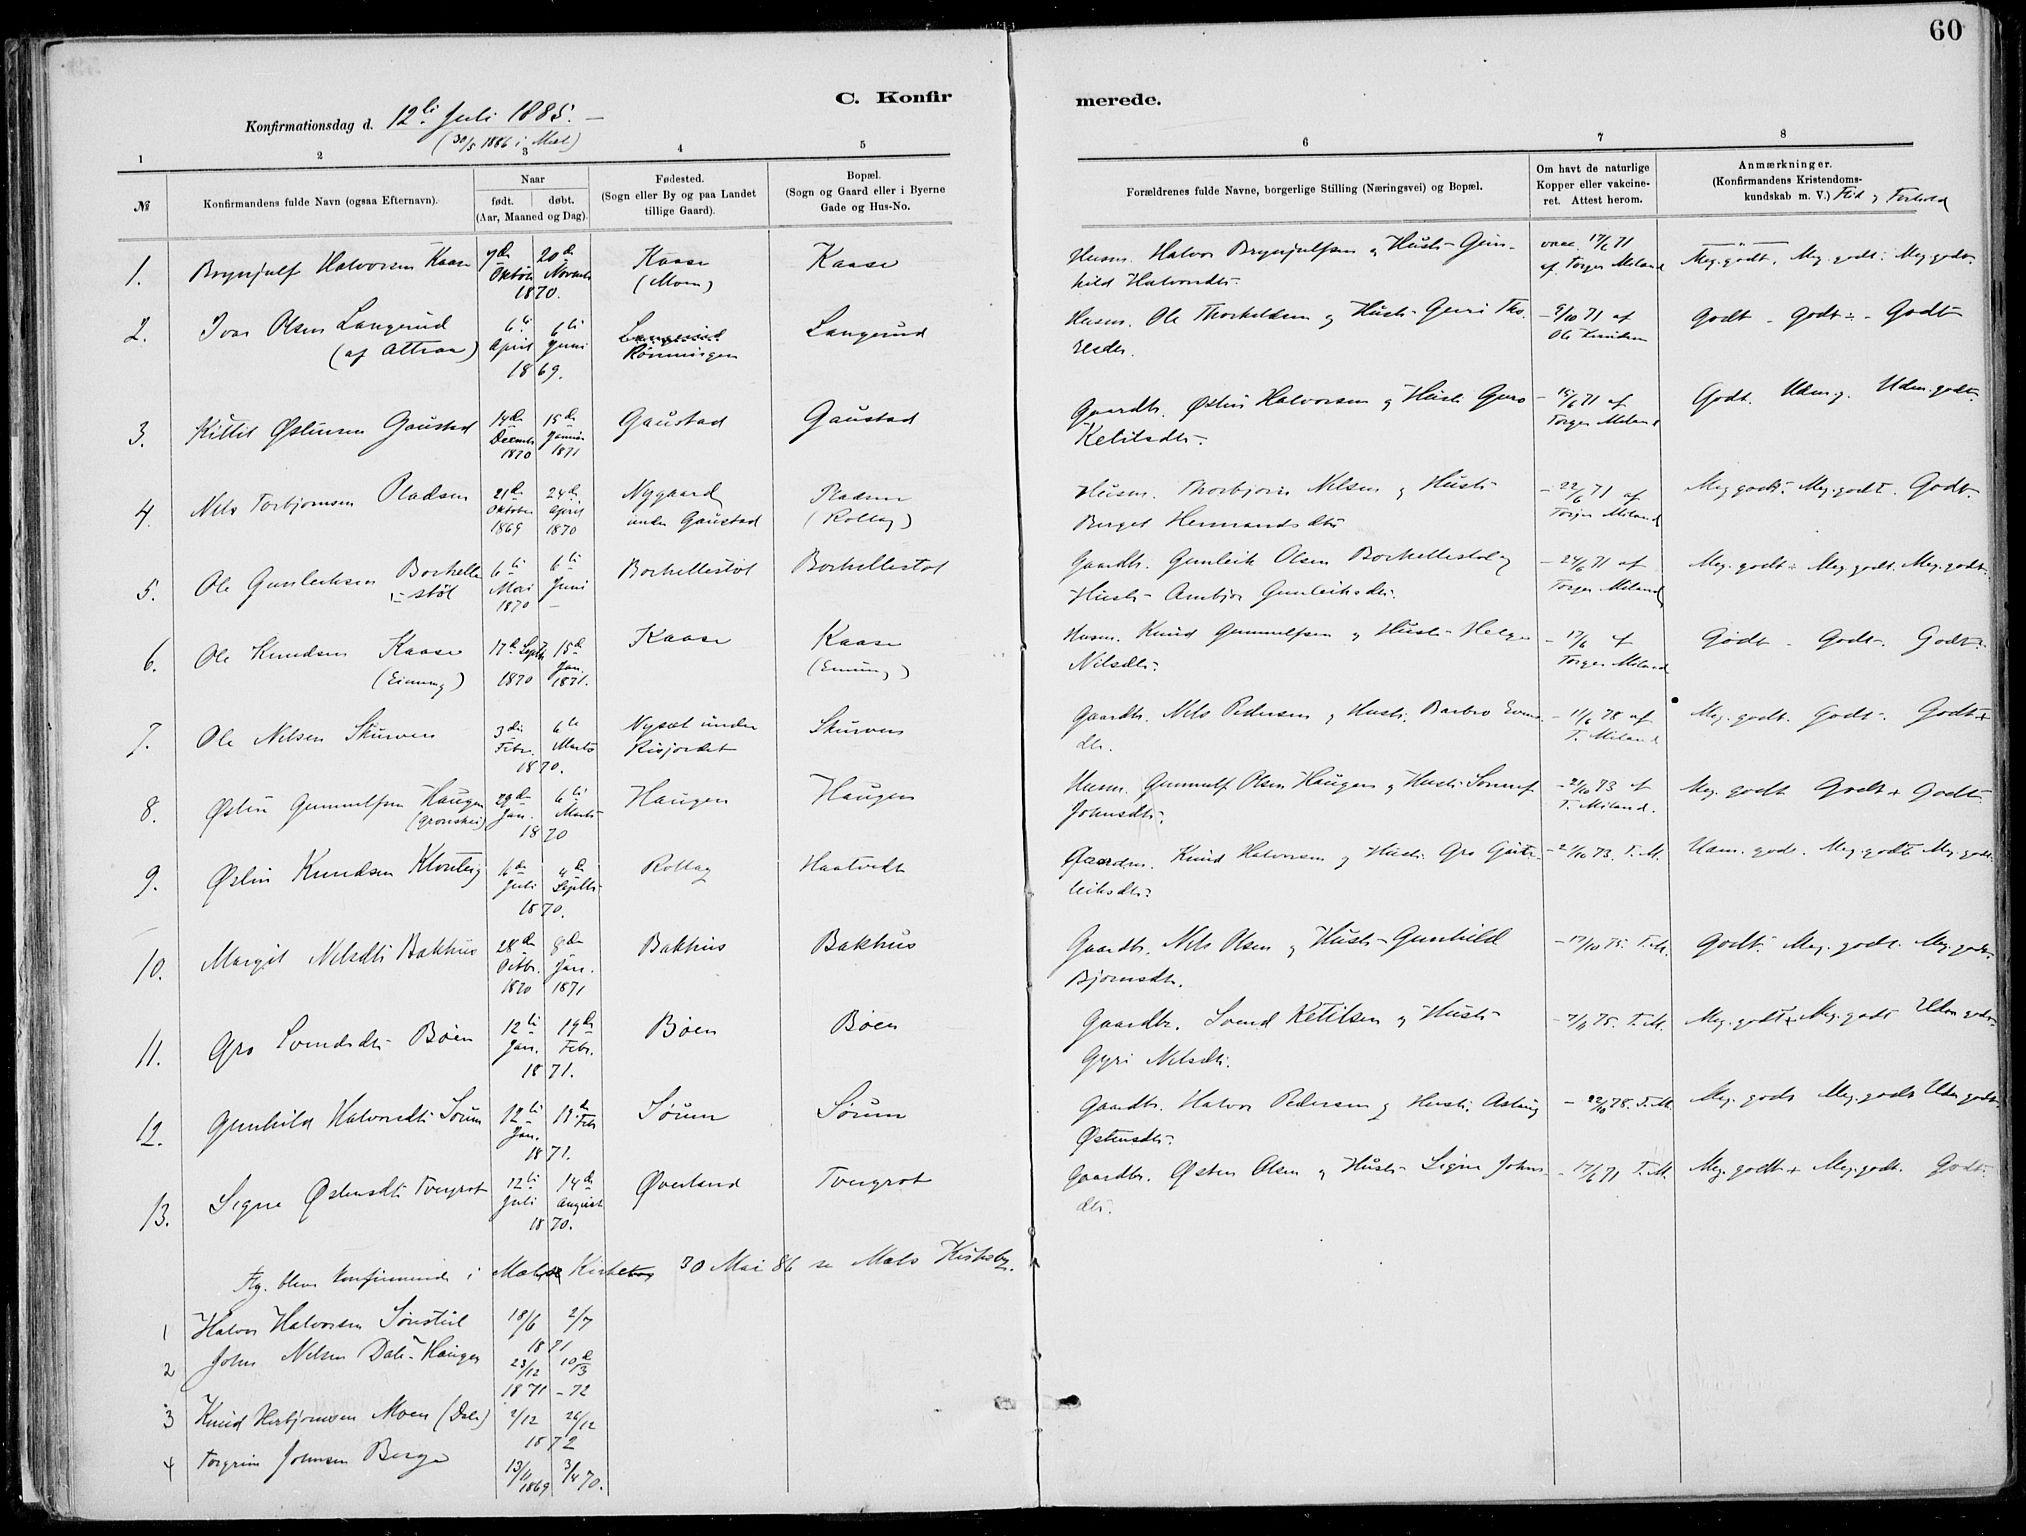 SAKO, Rjukan kirkebøker, F/Fa/L0001: Ministerialbok nr. 1, 1878-1912, s. 60